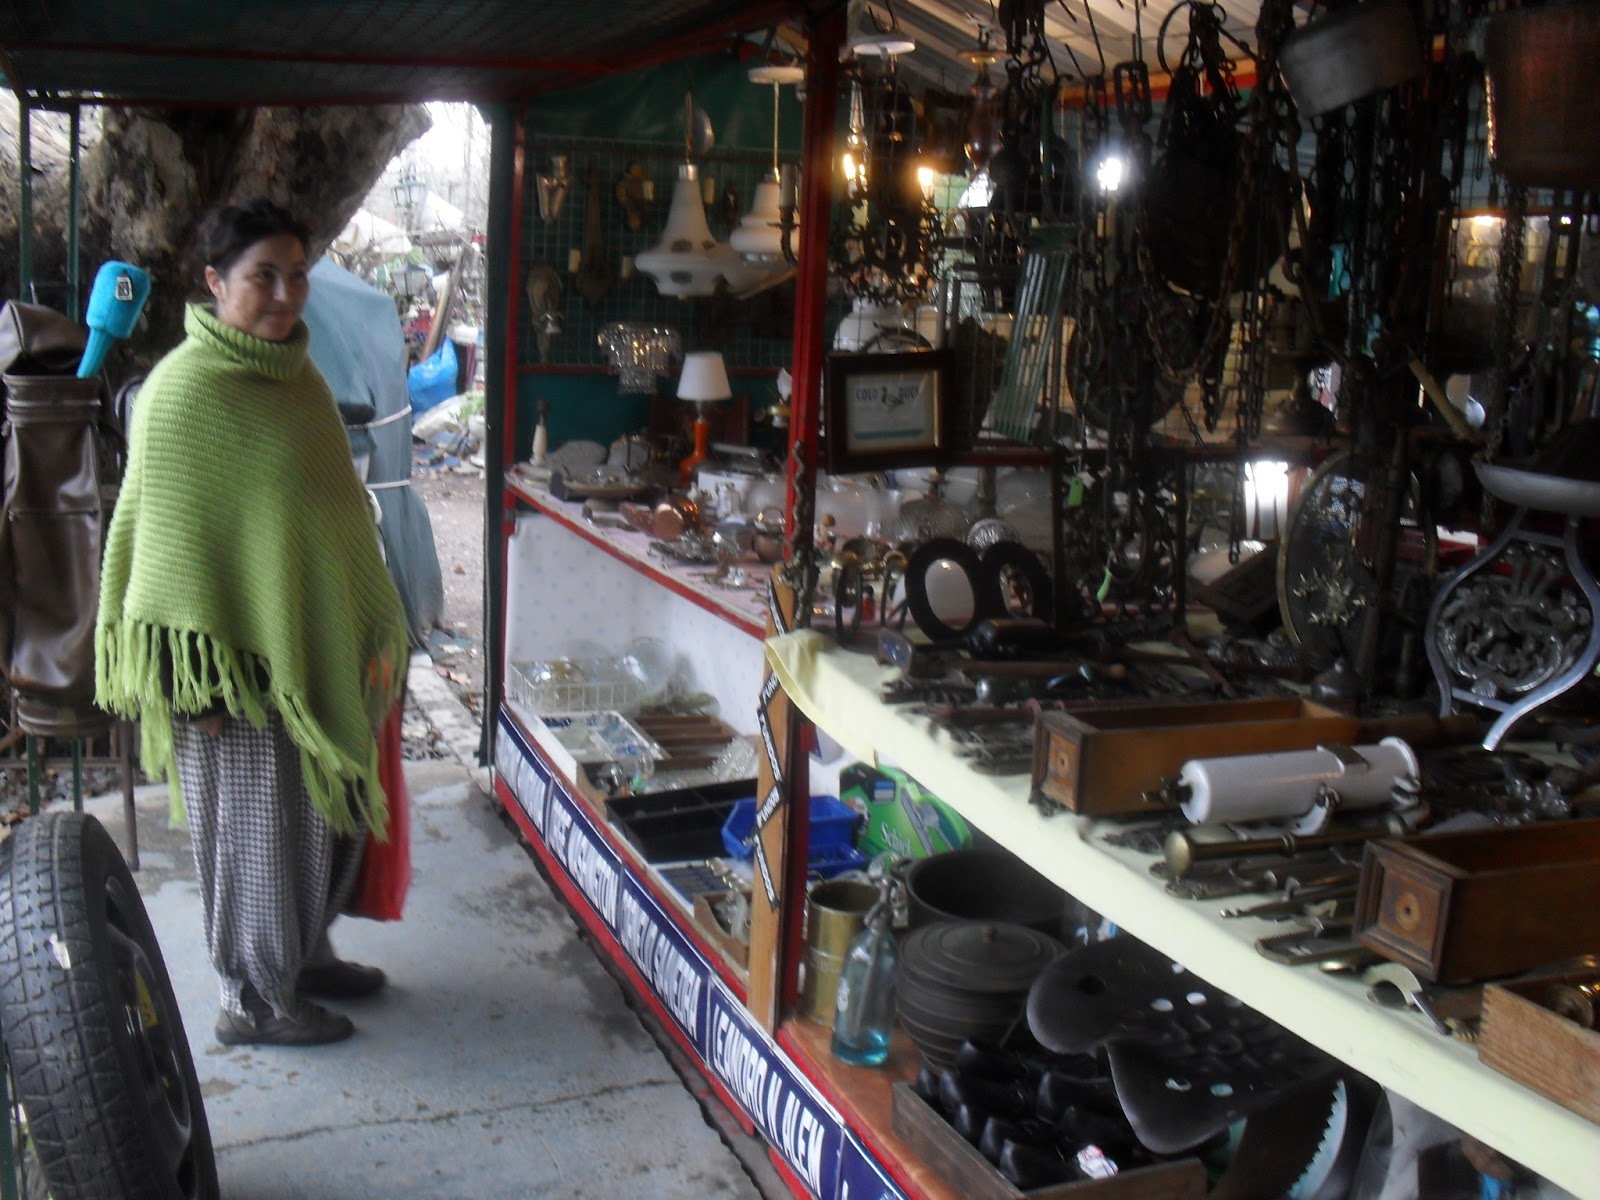 Brocanter A Turismo Brocante Mercados De Pulgas Del